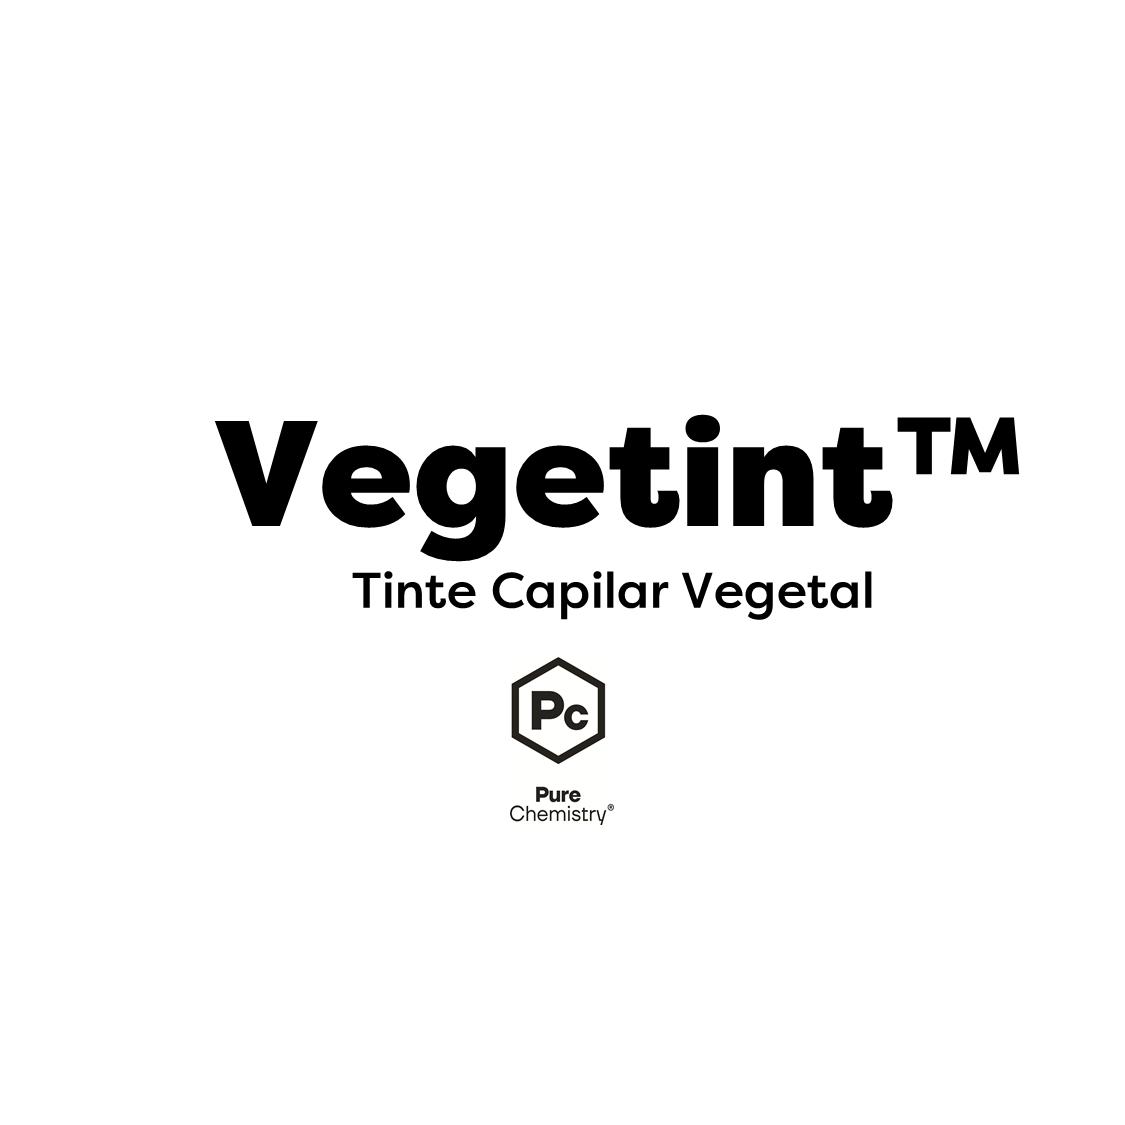 Vegetint™ Tinte Capilar Vegetal